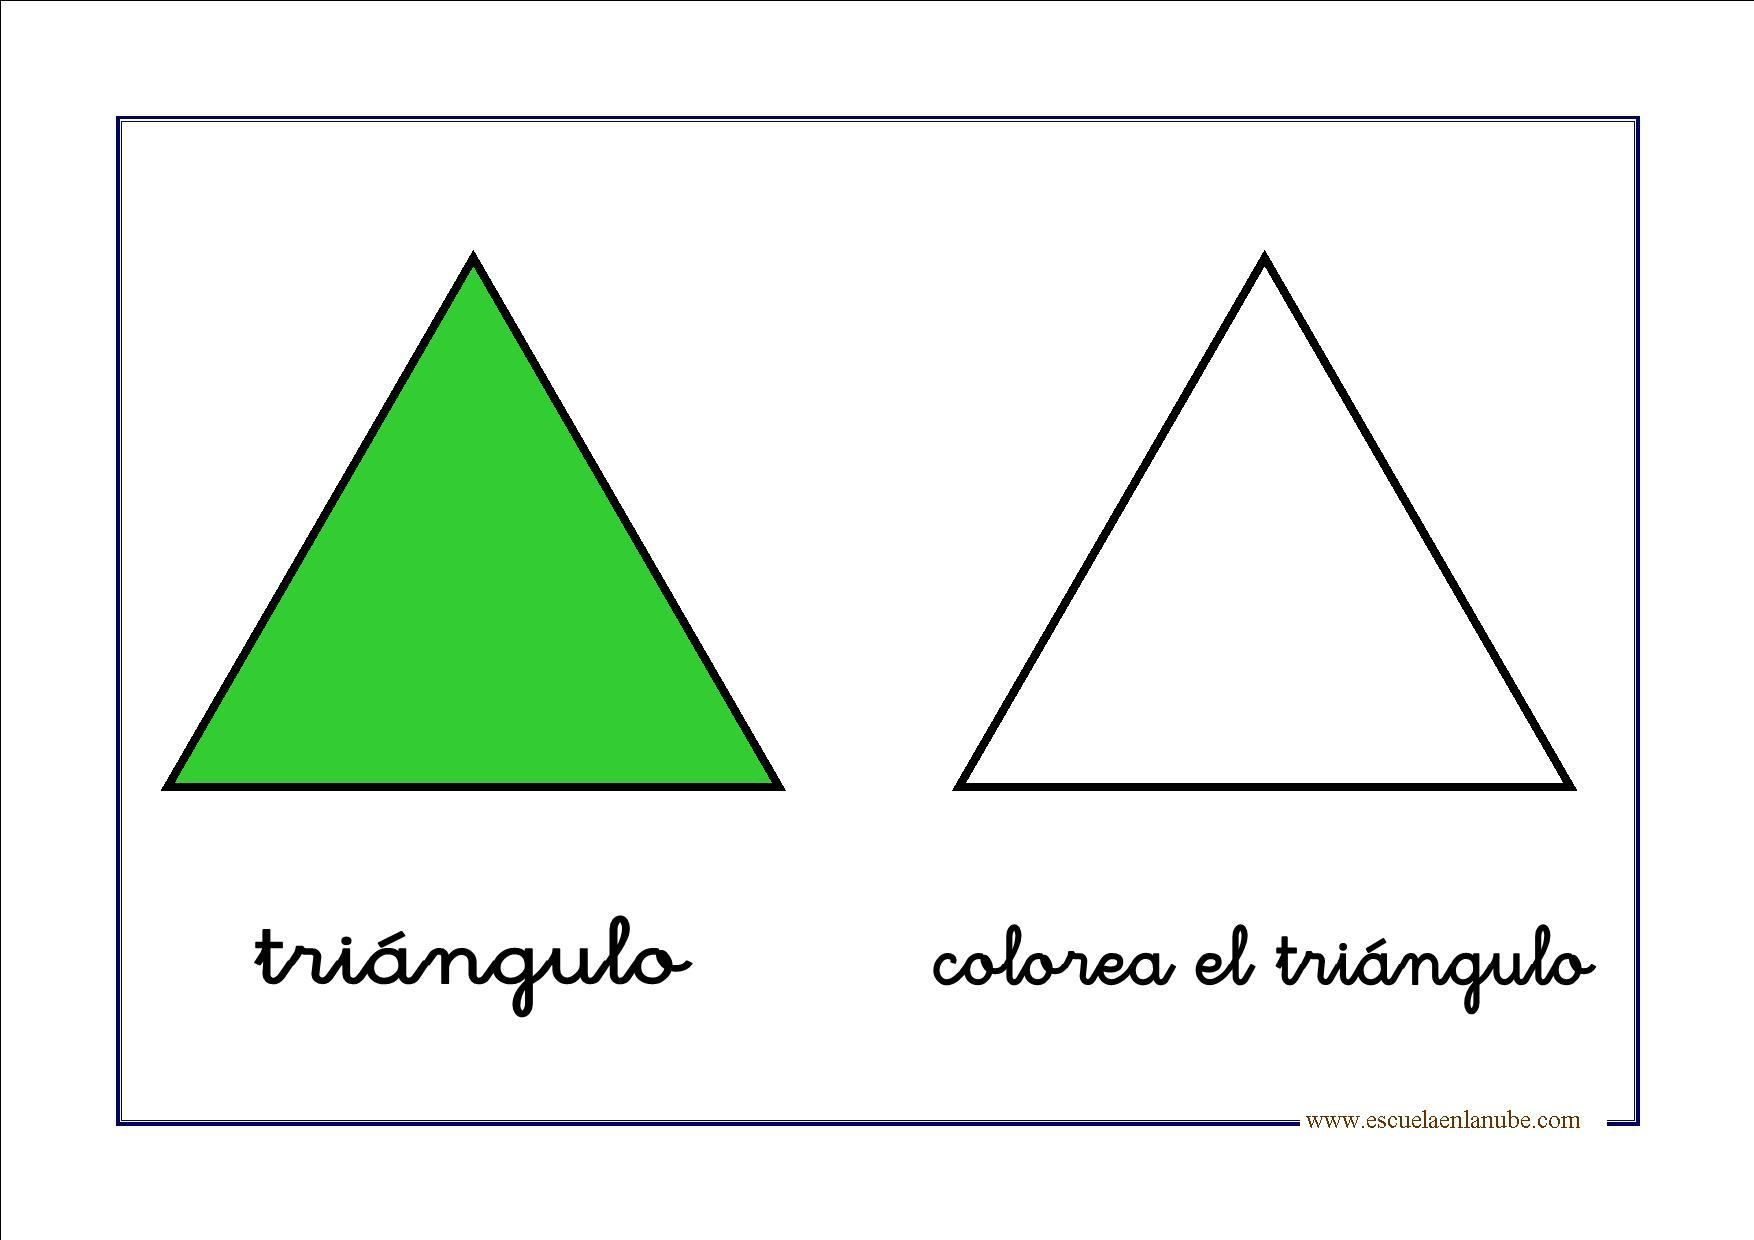 figuras-geometricas-triangulo.jpg 1.754×1.240 píxeles | Figuras ...